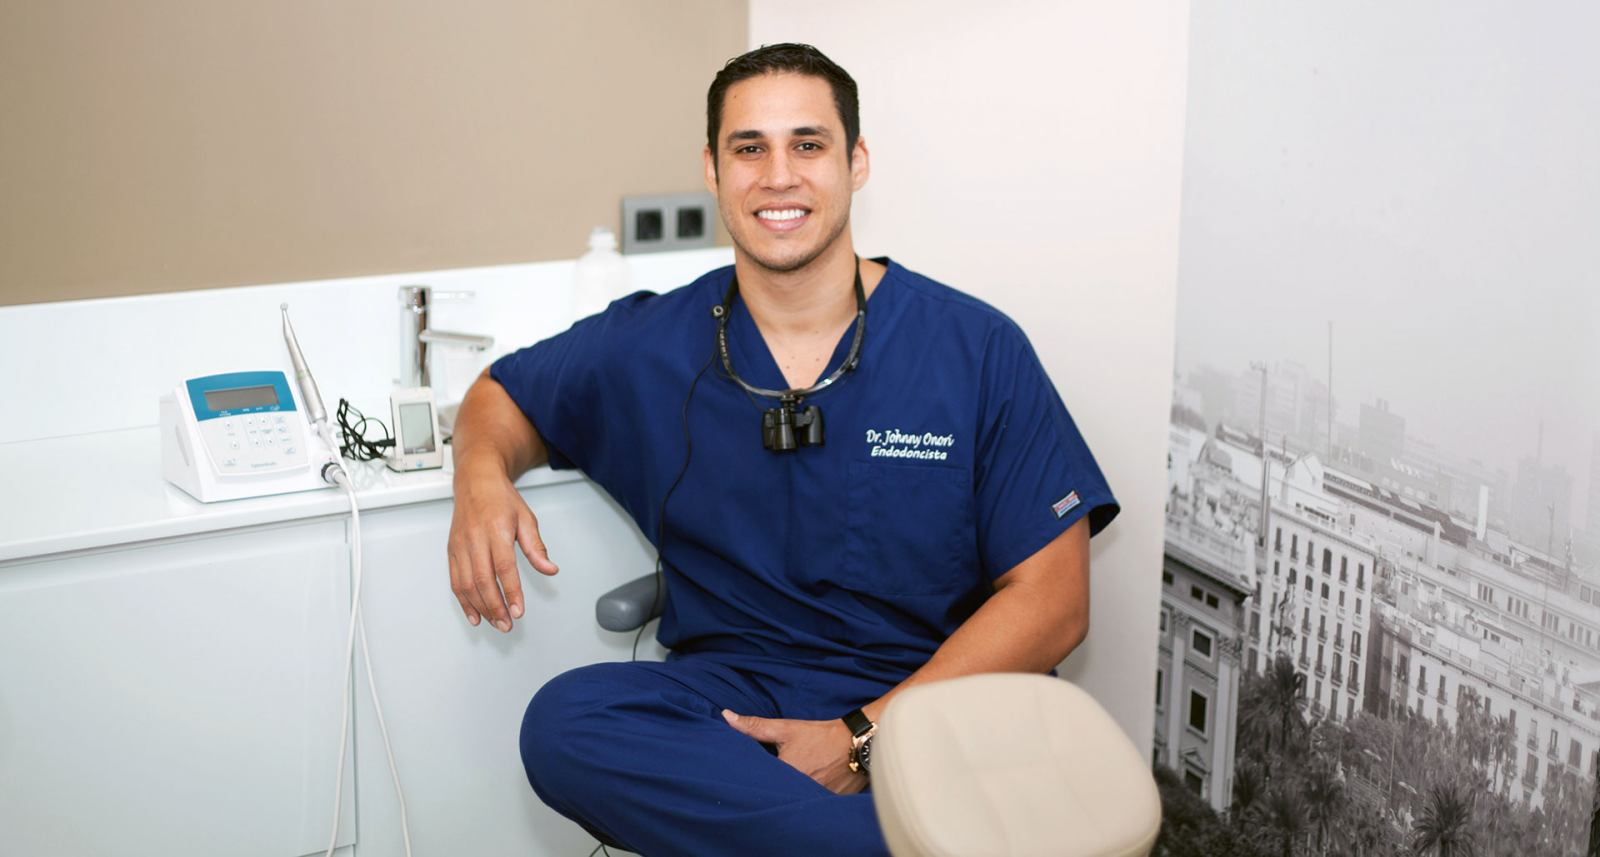 Doctor Jonny Onori Figueras. Odontologo en Sonríe tu clínica dental en Barcelona